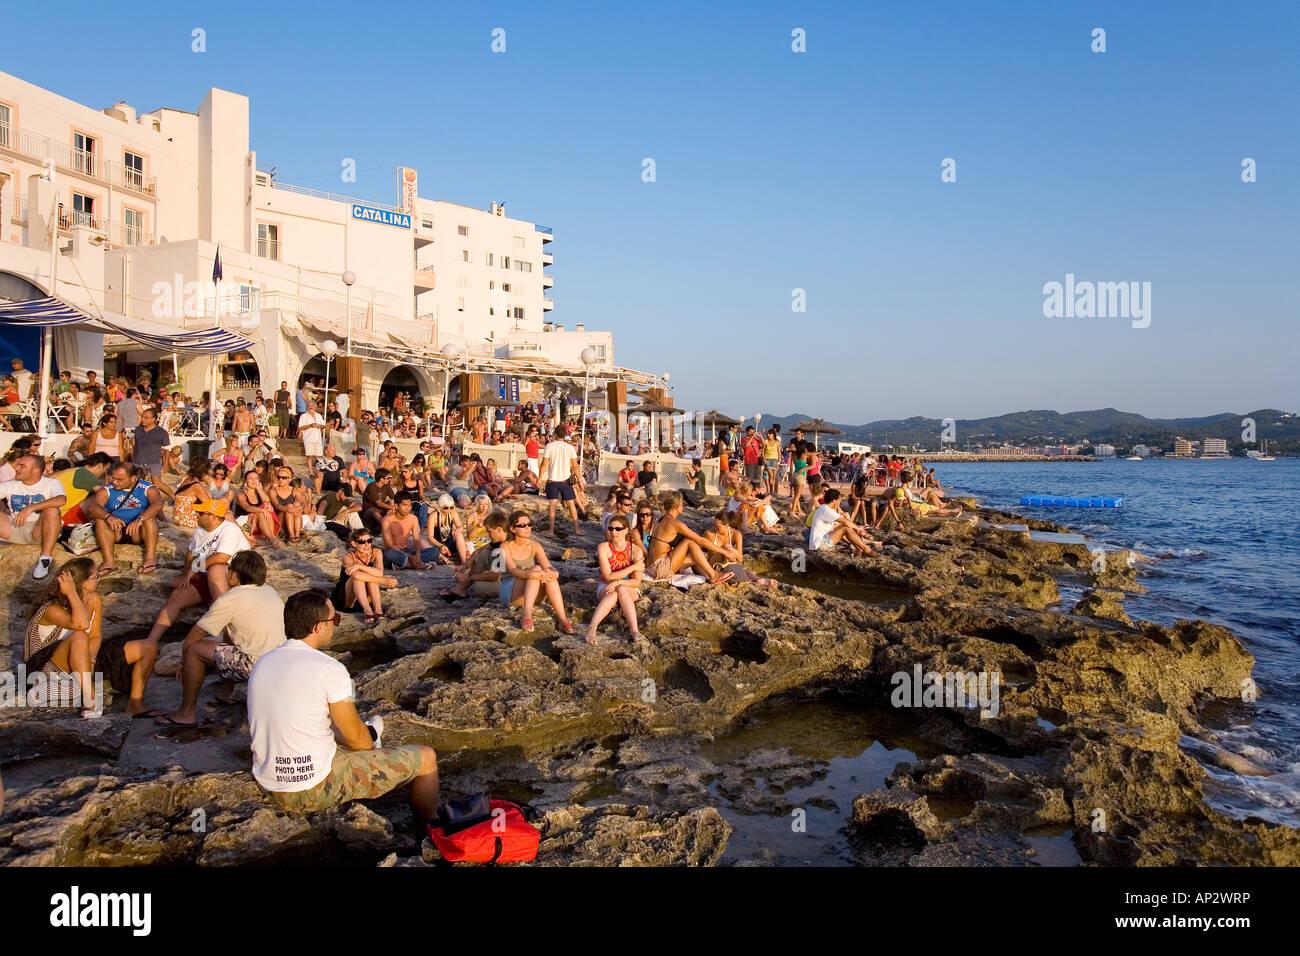 Cafe del Mar, Sant Antoni de Portmany, Ibiza, Balearic Islands, Spain - Stock Image